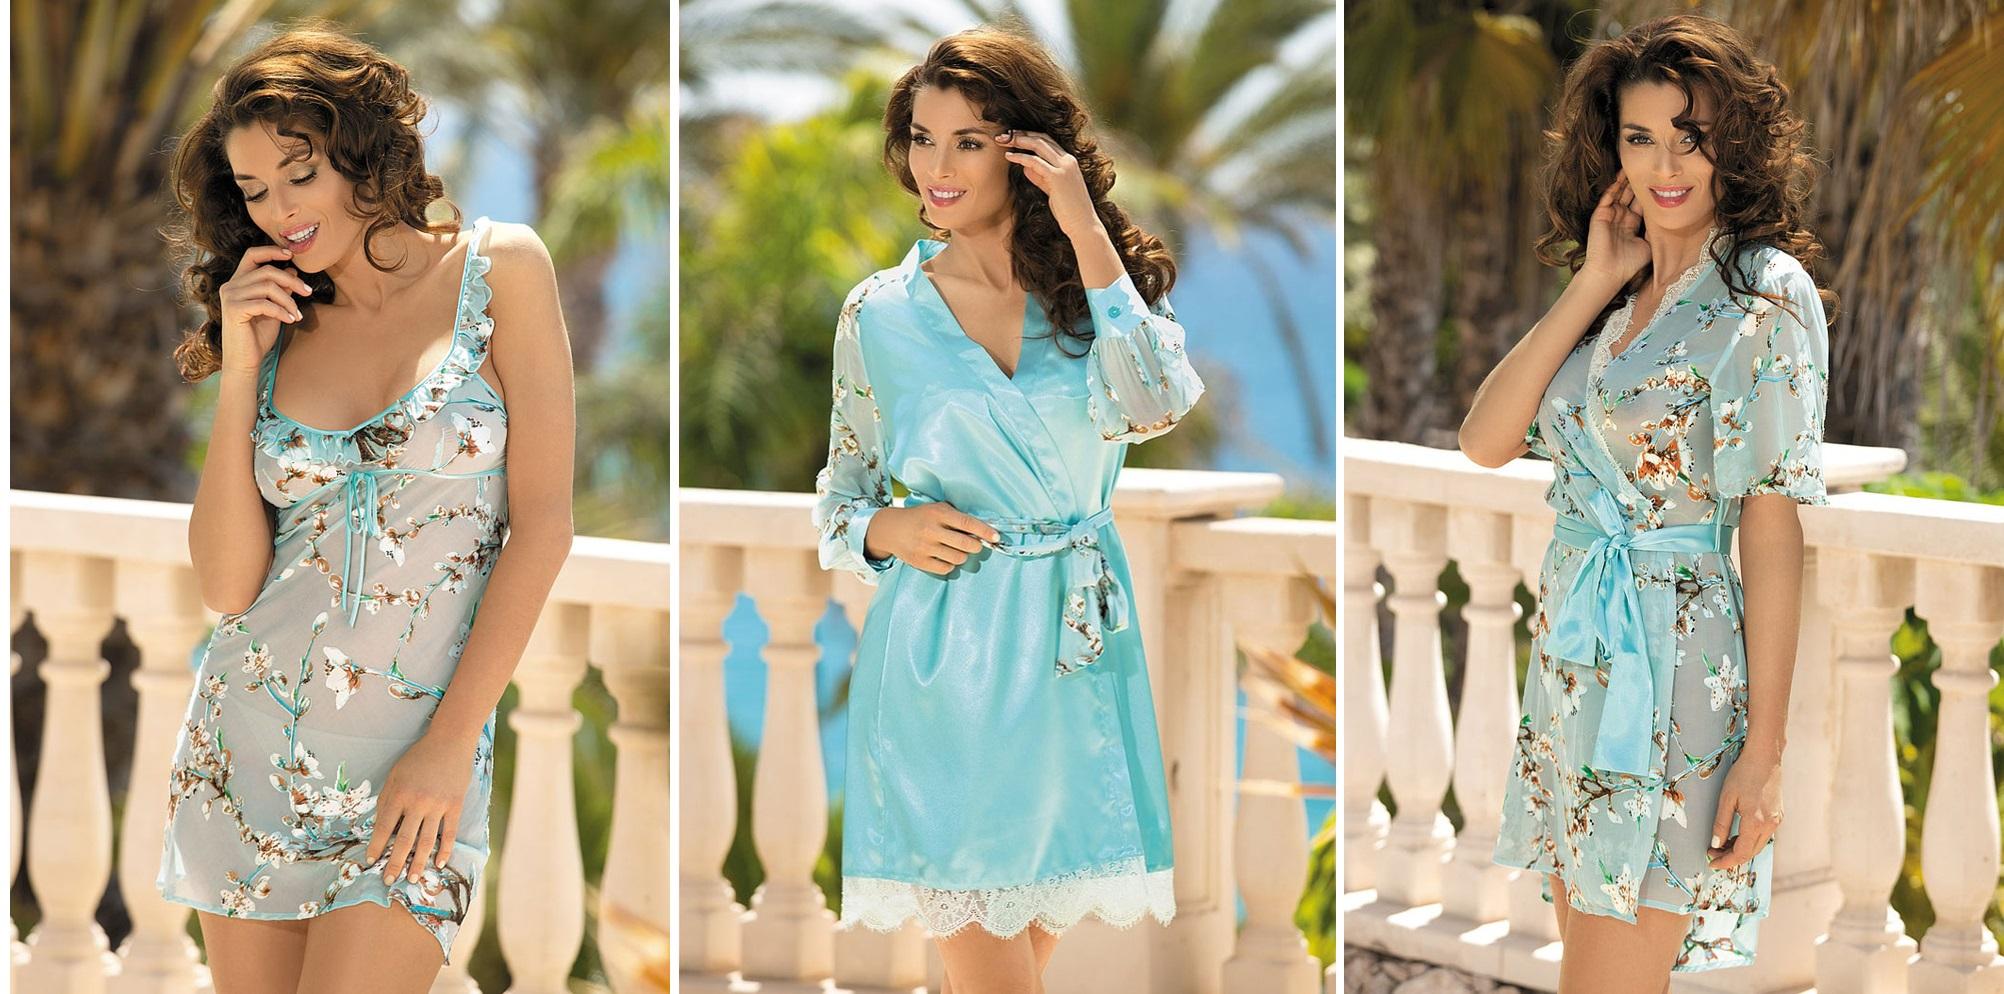 Женские сорочки и халаты Akira Mia-Mia купить интернет-магазин